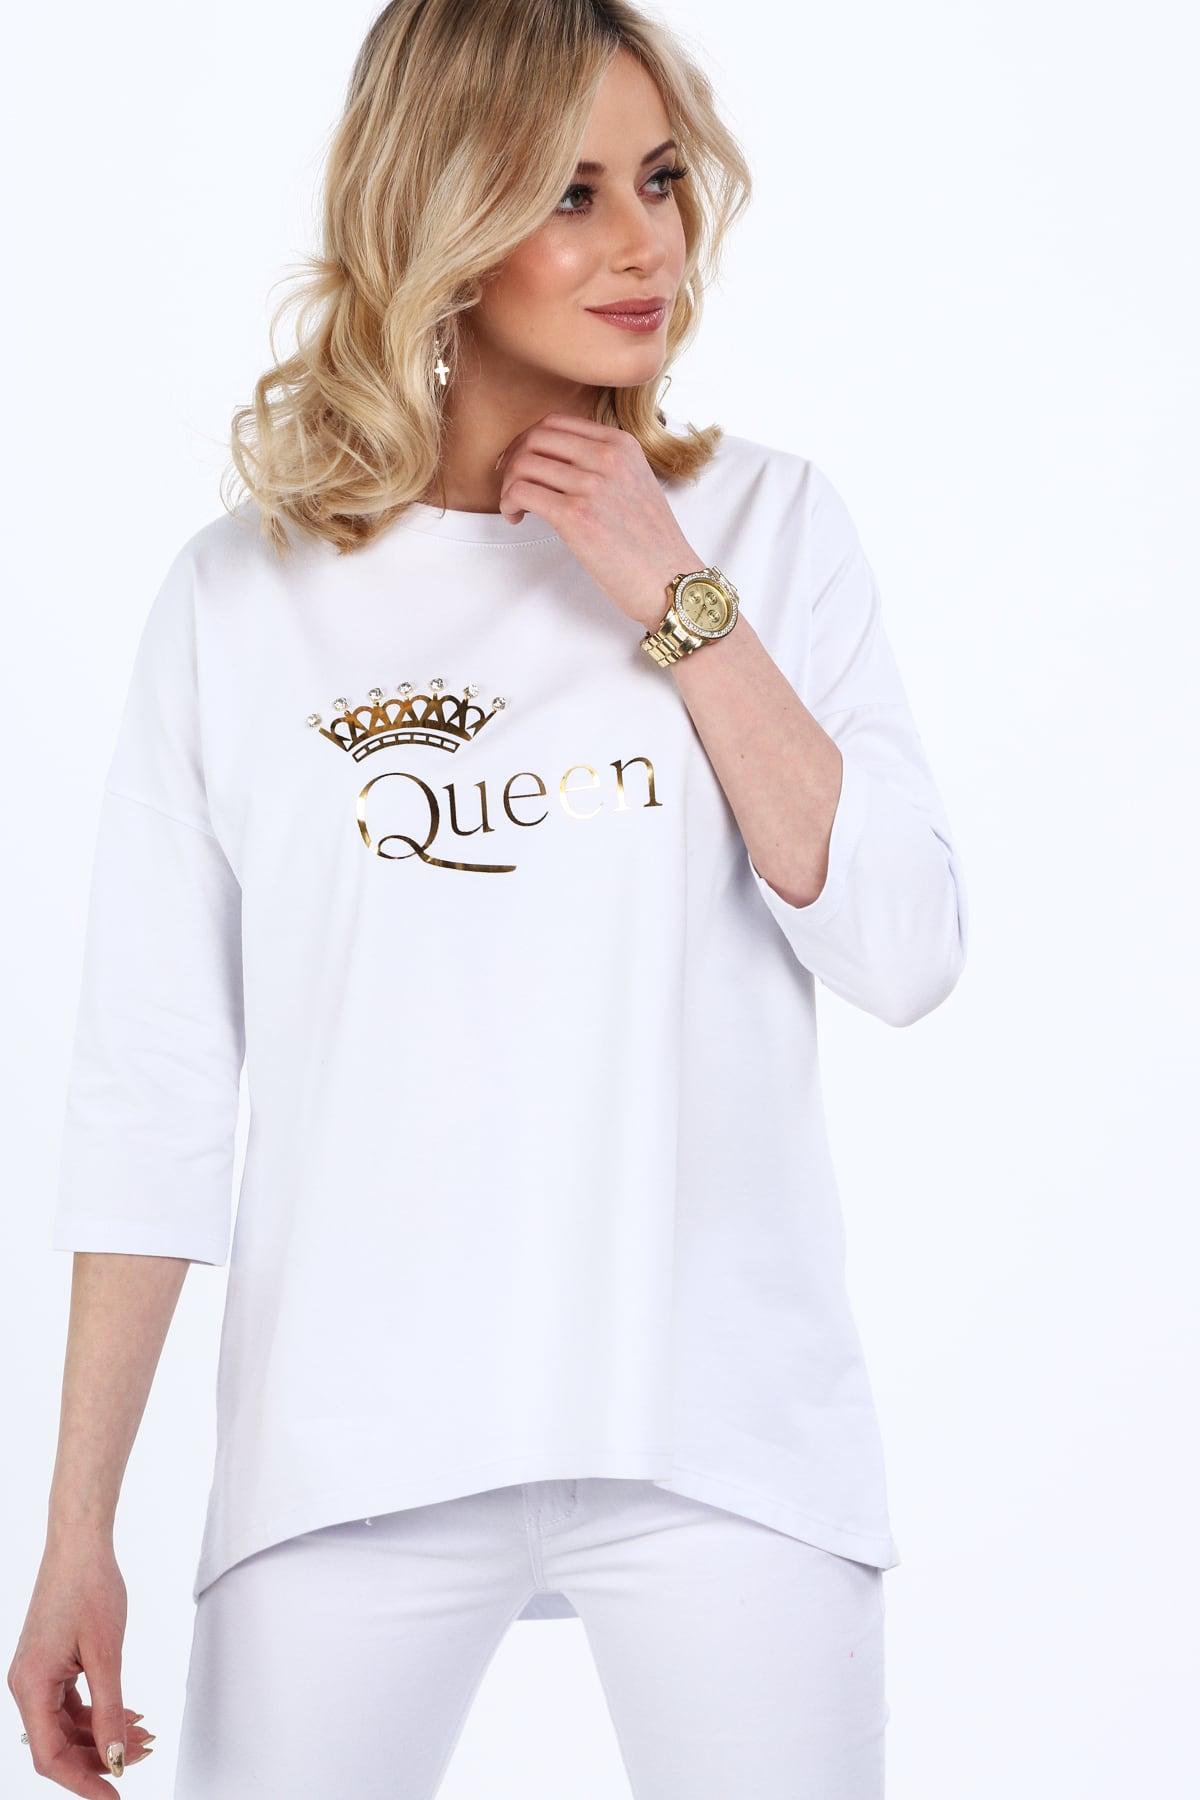 Biela tunika so zlatým nadpisom